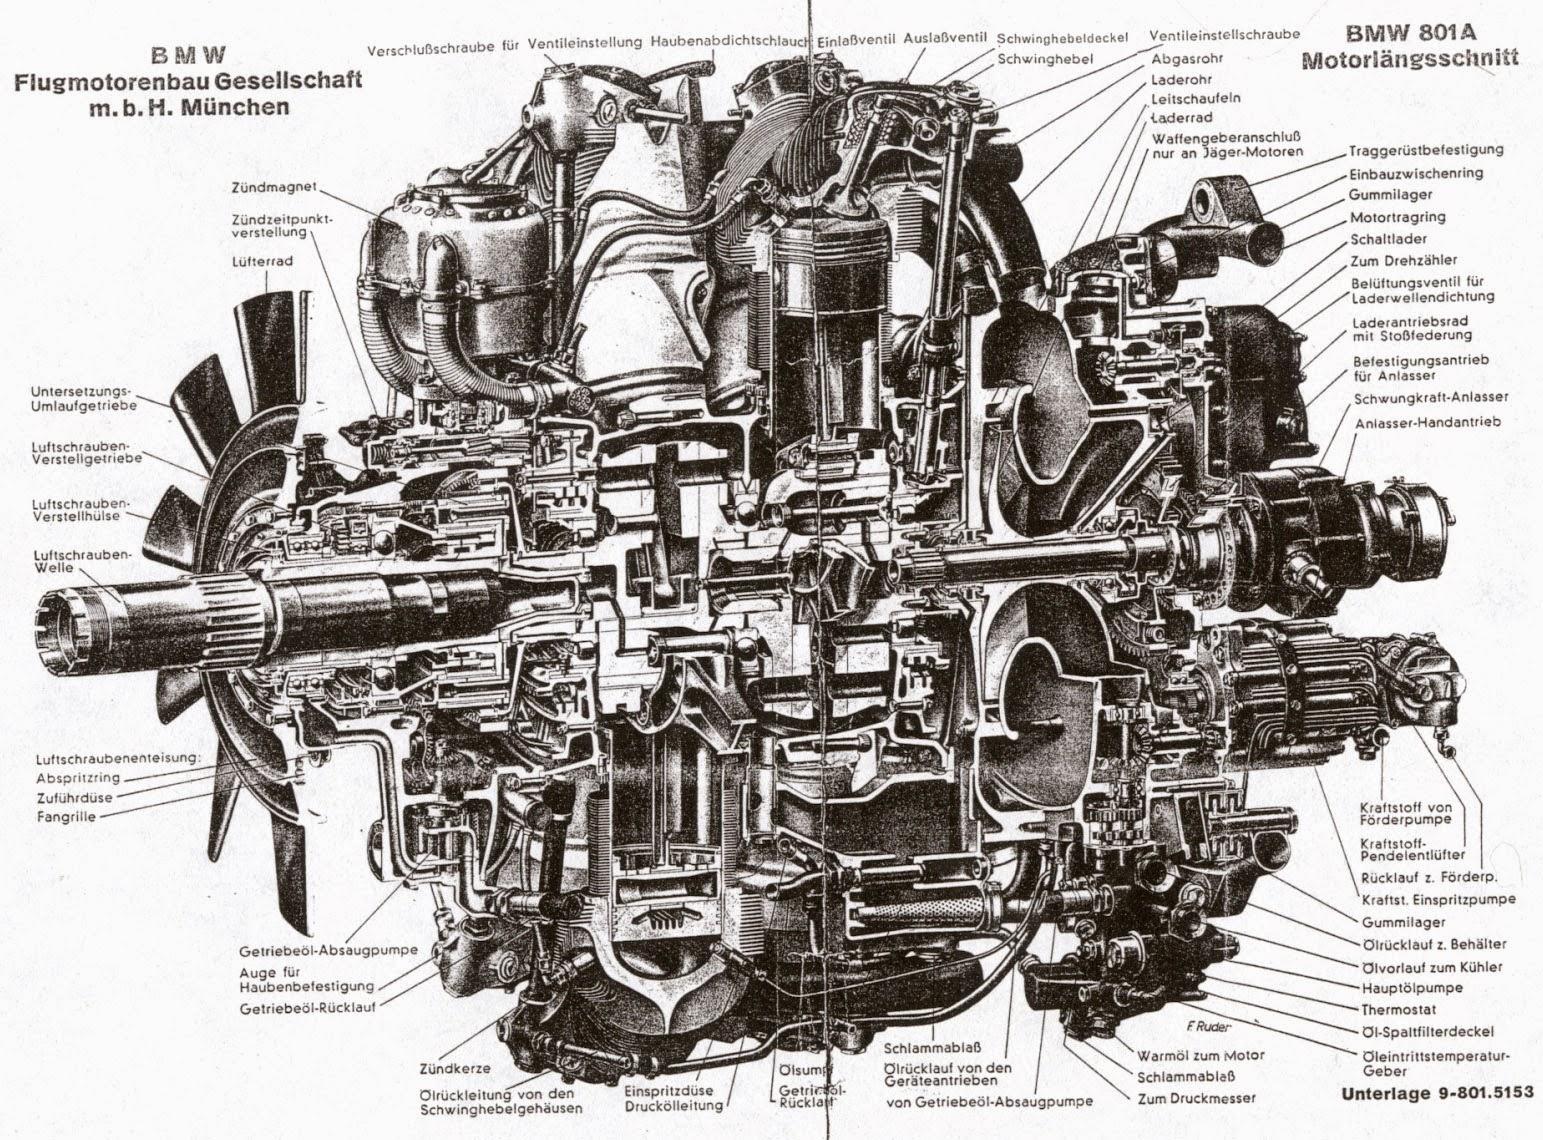 [SCHEMATICS_48DE]  automotive blog: Detailed Cutaway Diagram Engine From Original Manual | Detailed Engine Diagram |  | automotive blog